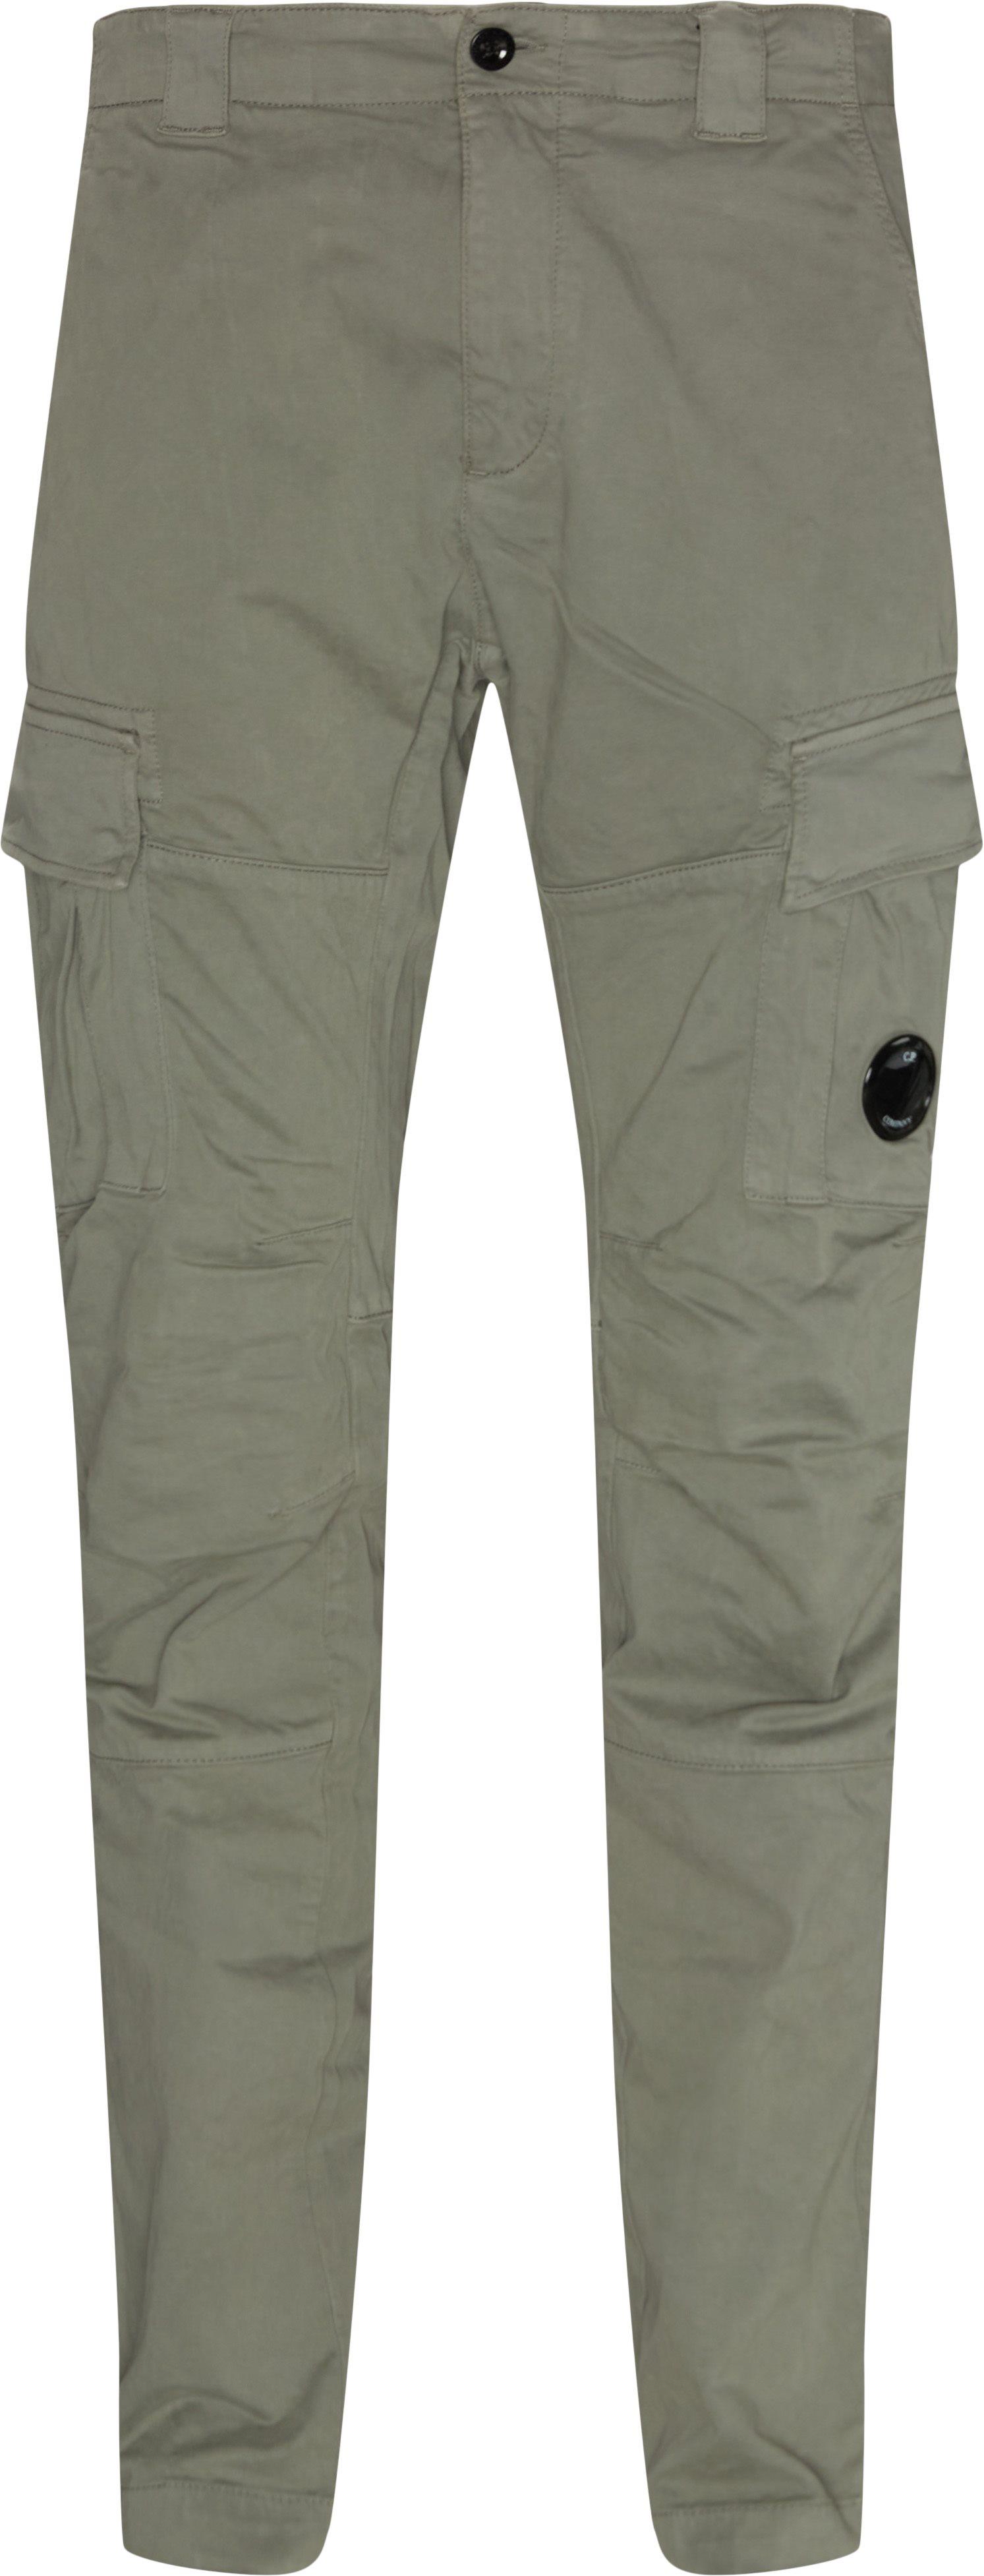 Trousers - Regular fit - Grey